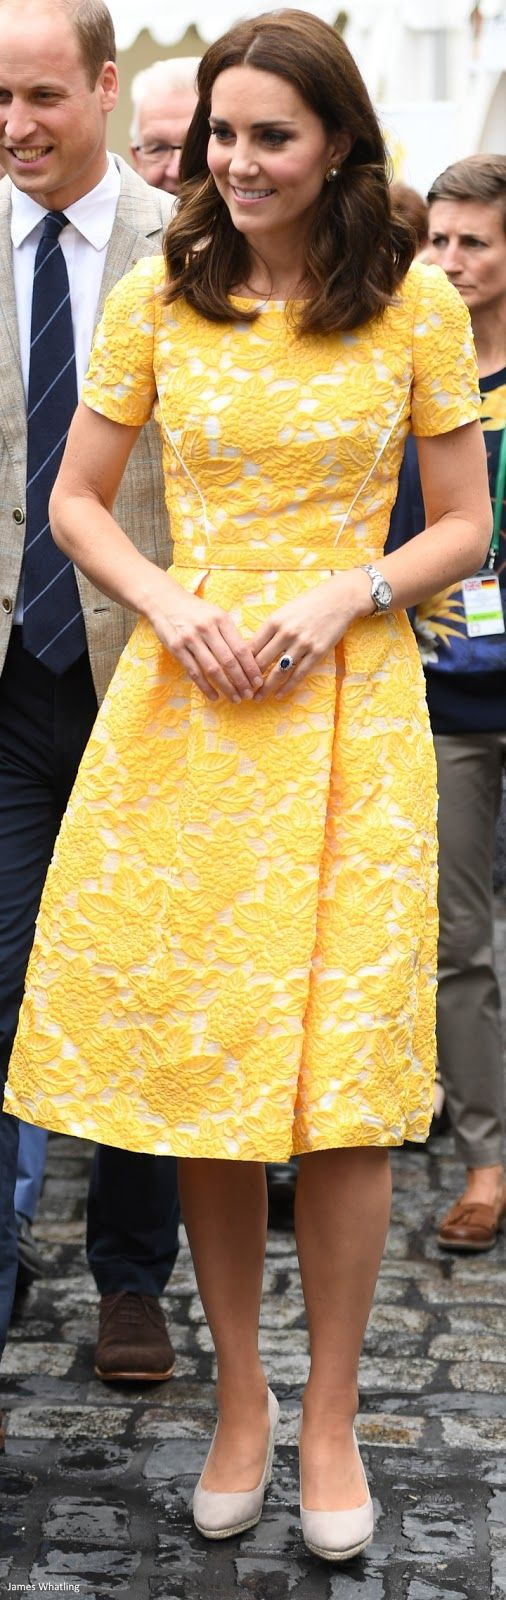 Kate in Germany, 2017. Jenny Packham dress